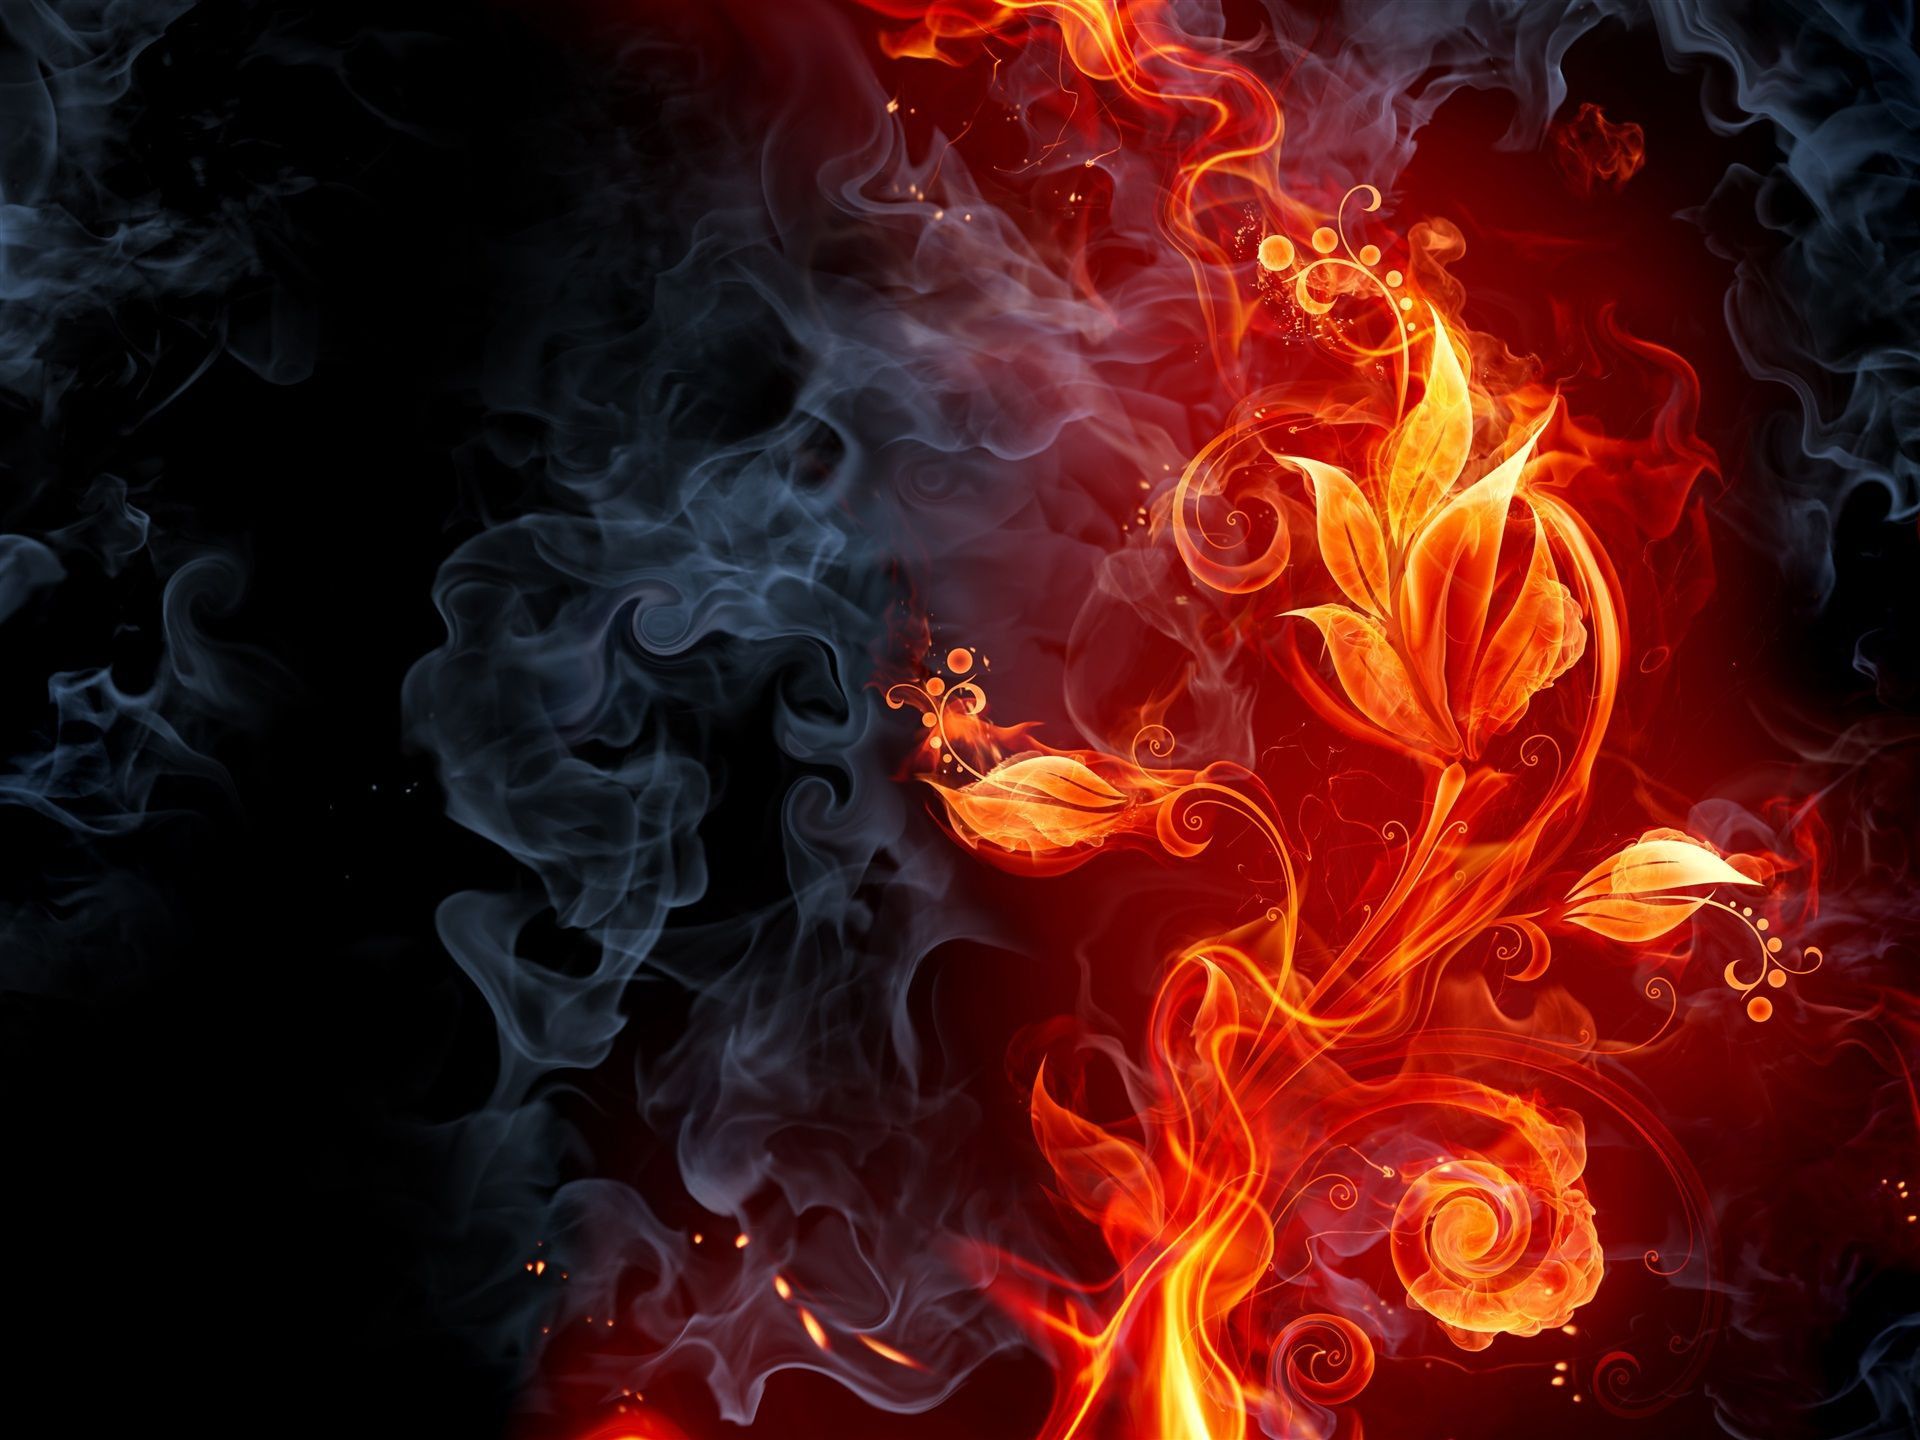 4k Wallpaper Abstraction Flower Smoke Fire 4000x3000 Fire Flower Flower Wallpaper Smoke Background